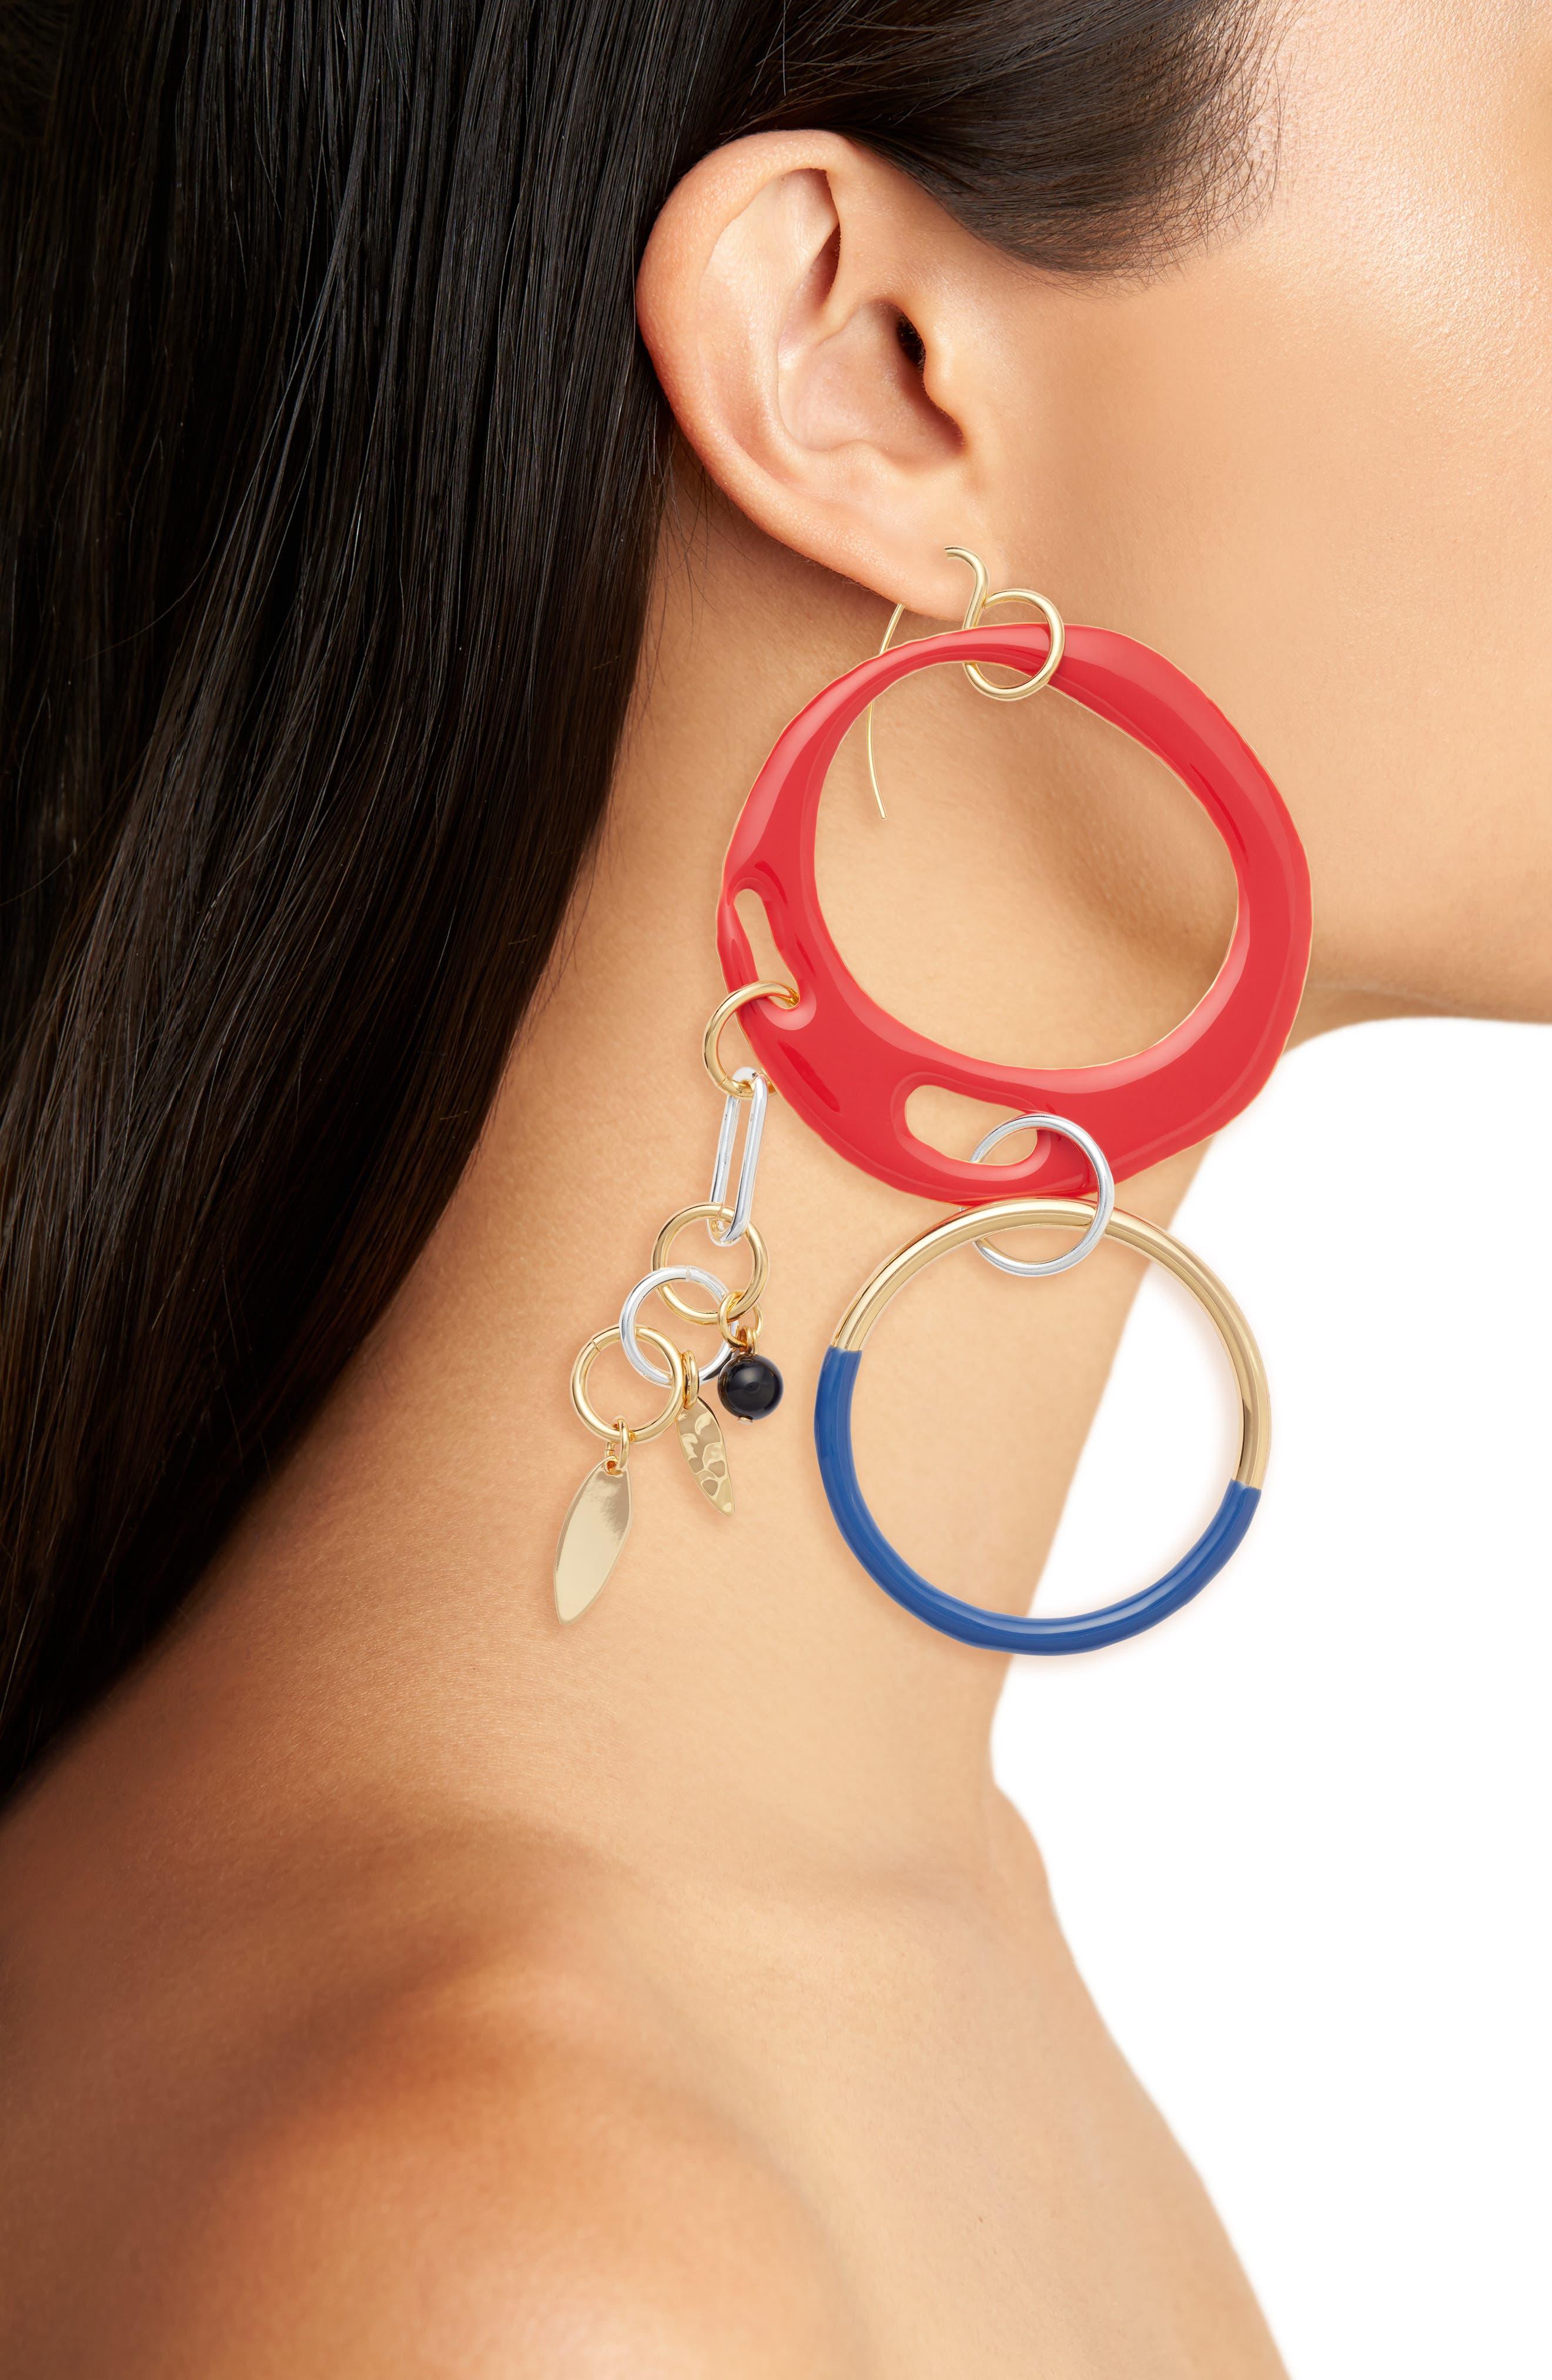 Asymmetrical Charm Earrings,                             Alternate thumbnail 2, color,                             600